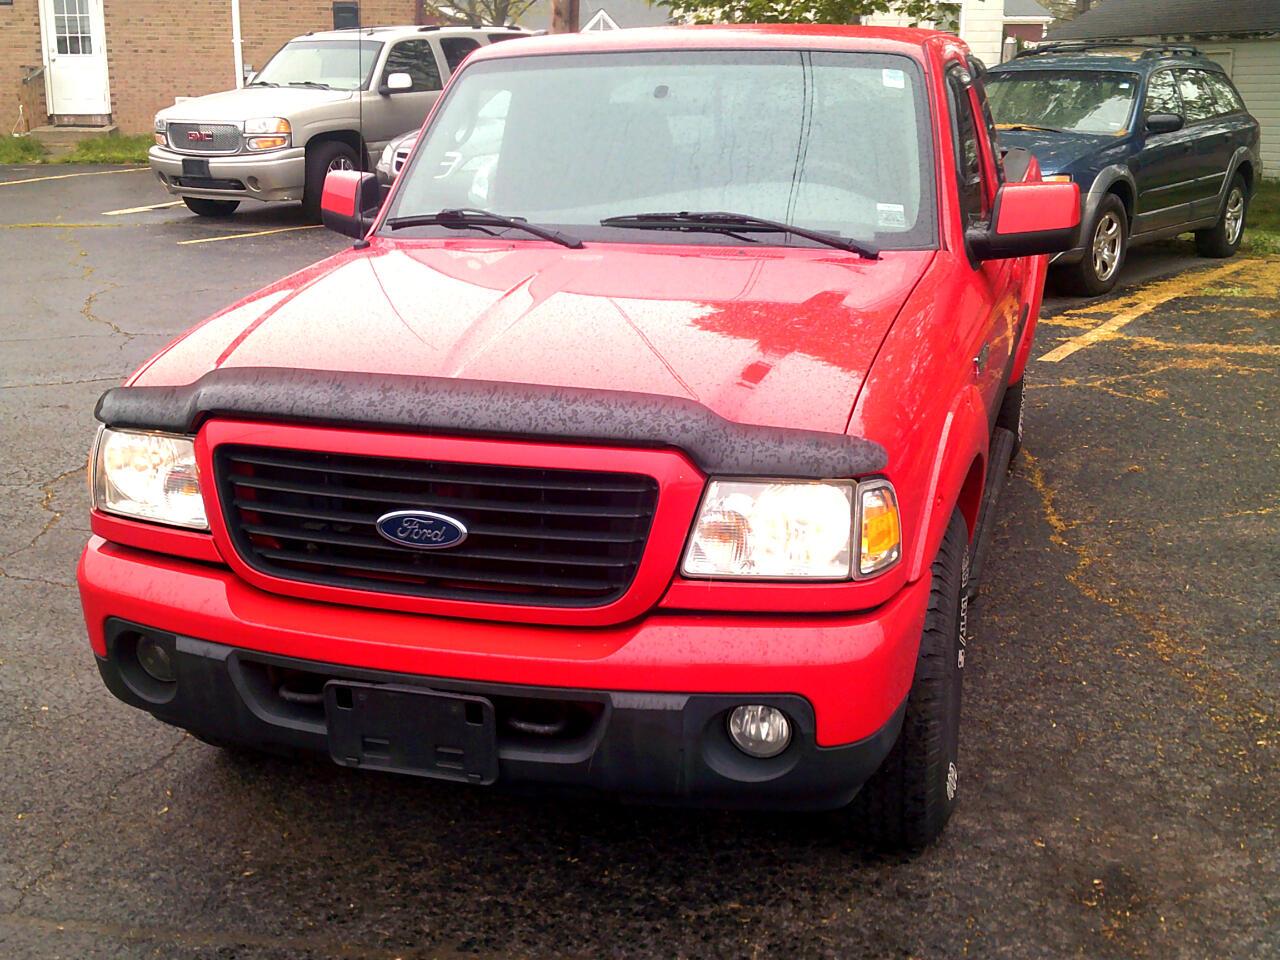 "Ford Ranger 4WD 4dr SuperCab 126"" FX4 Off-Road 2009"